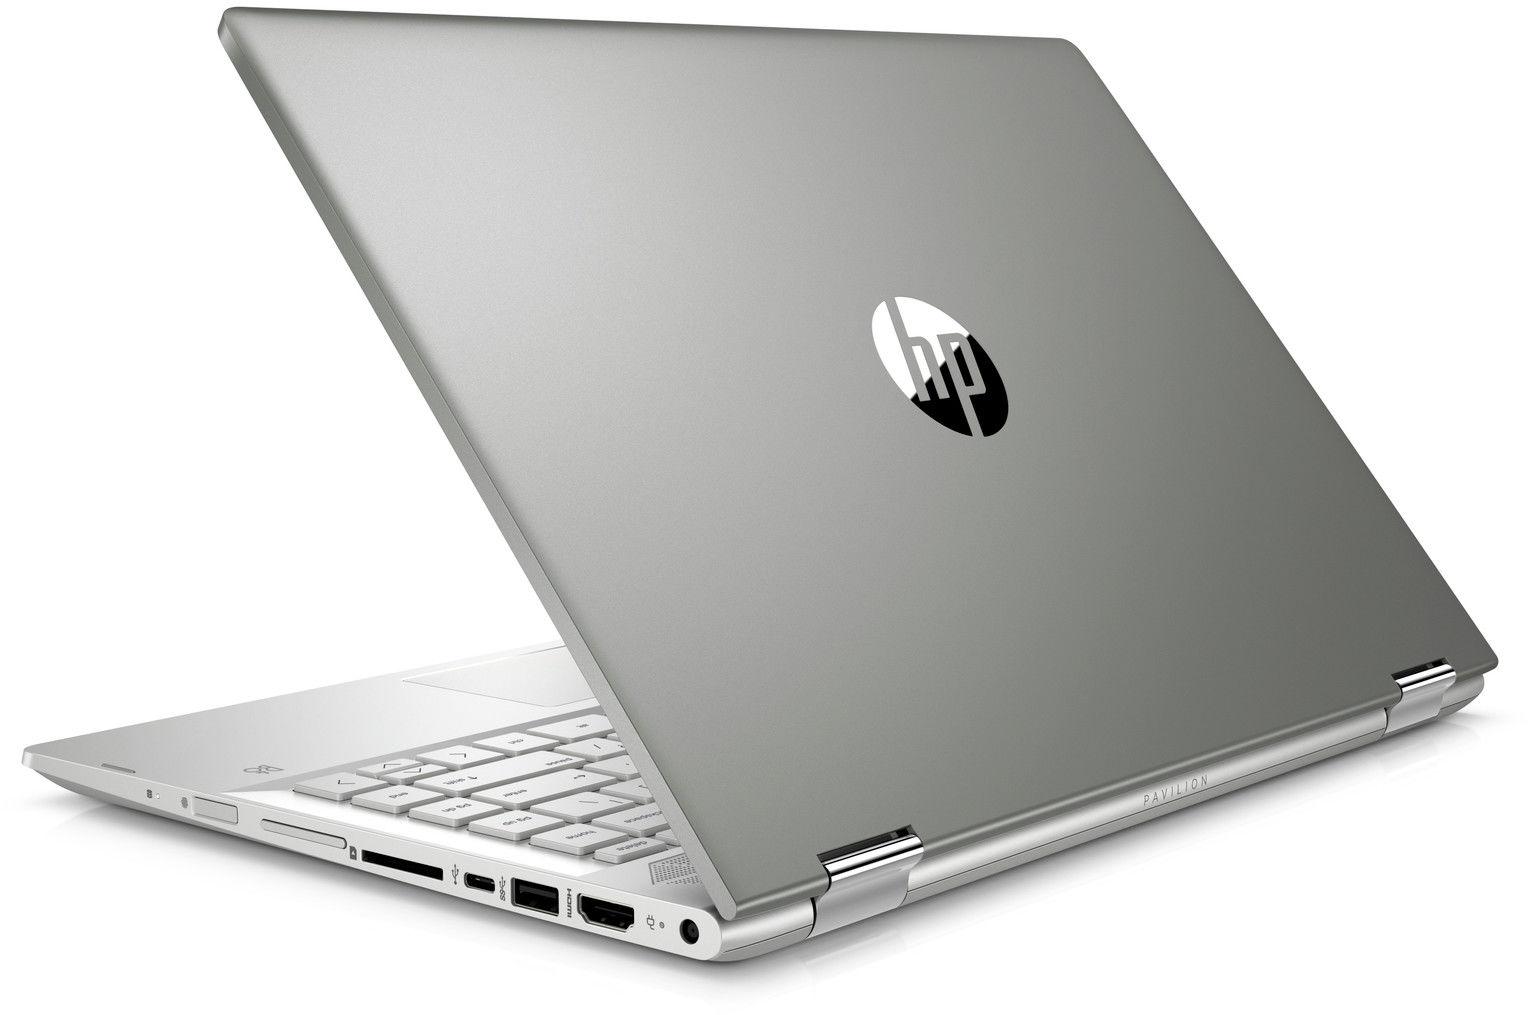 Laptop HP Pavilion x360 14-cd1800nd 5SS65EAR